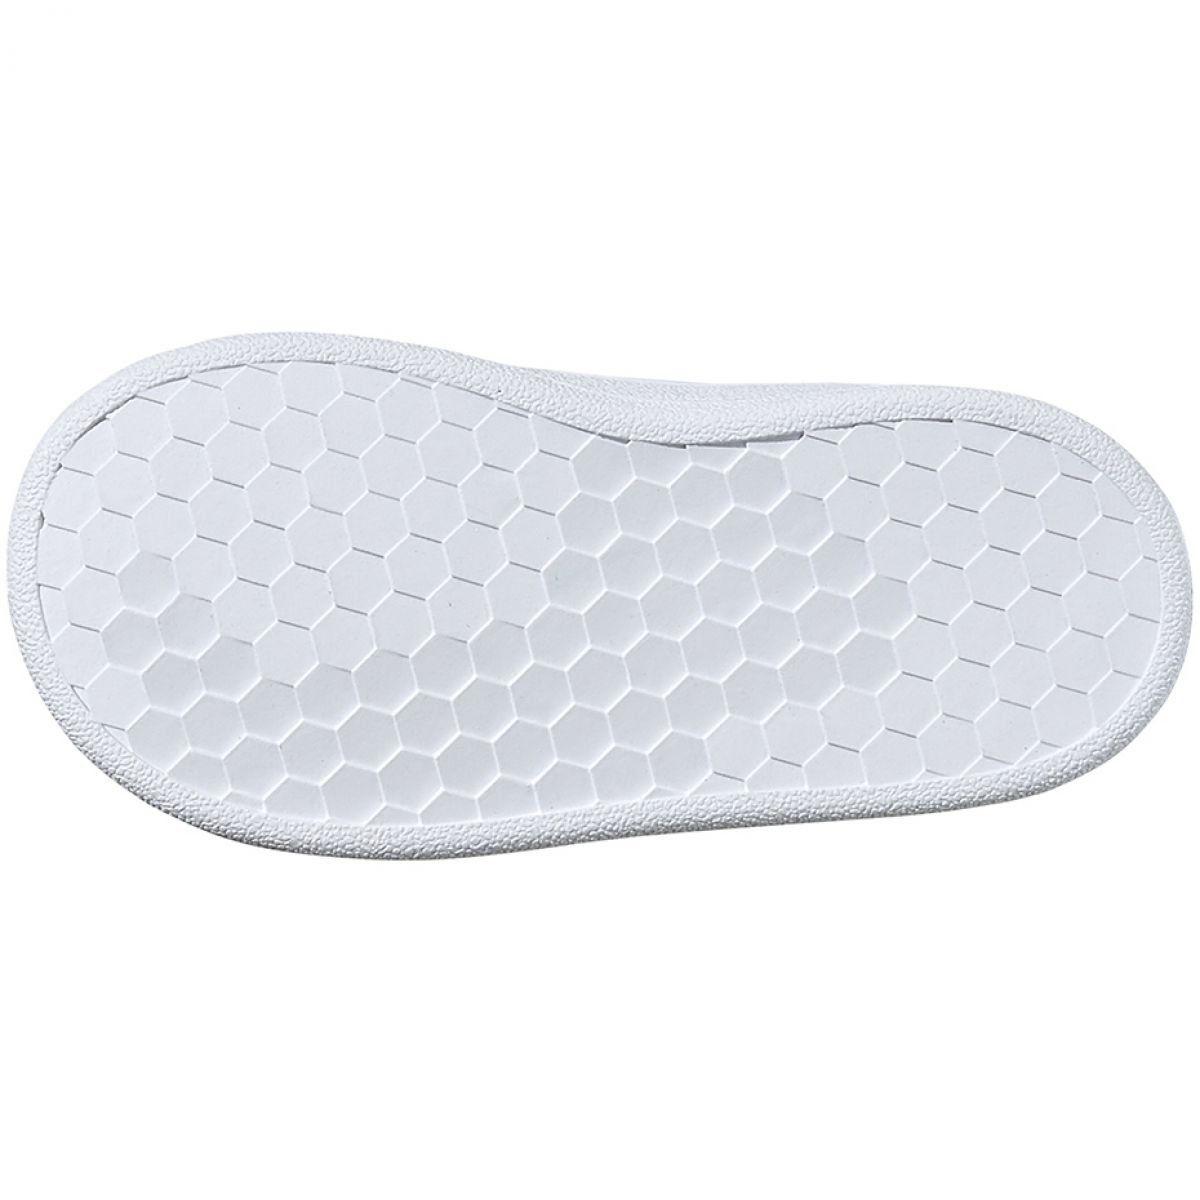 Buty Adidas Advantage I Jr Ef0305 Biale Adidas White Shoes Sports Shoes Adidas Shoes